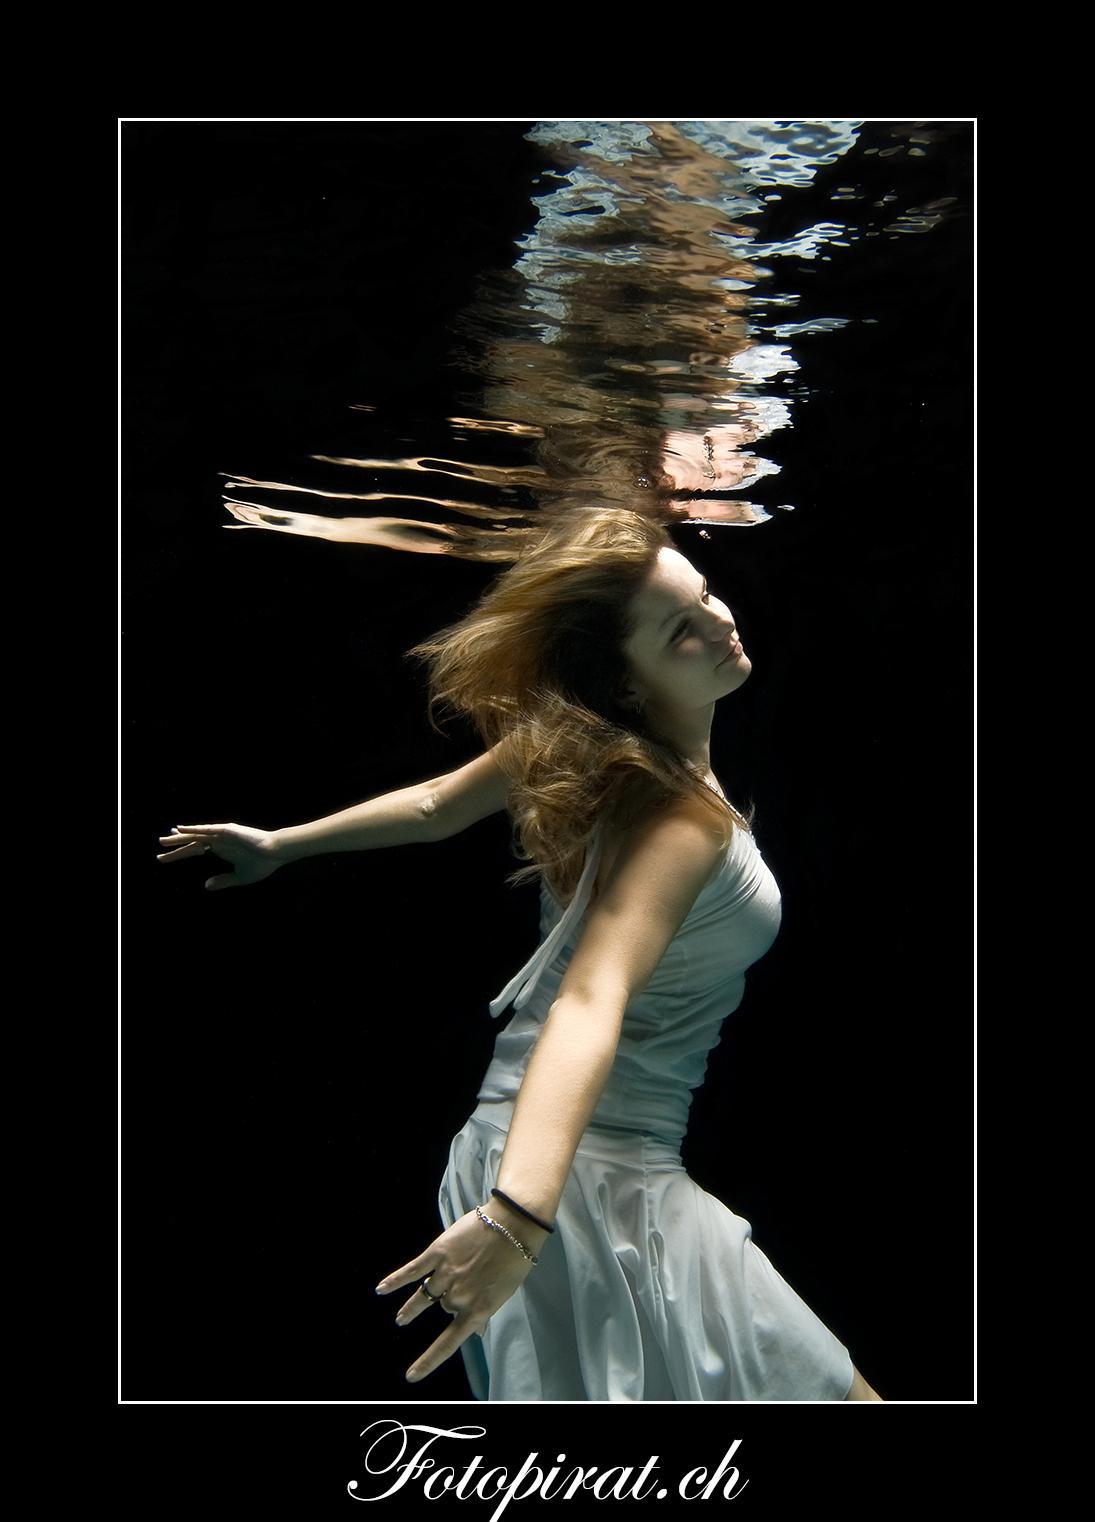 Unterwasser Fotoshooting, underwater Photoshooting, Teilakt, Nude, Fotoshooting Zürich, Pia Burren